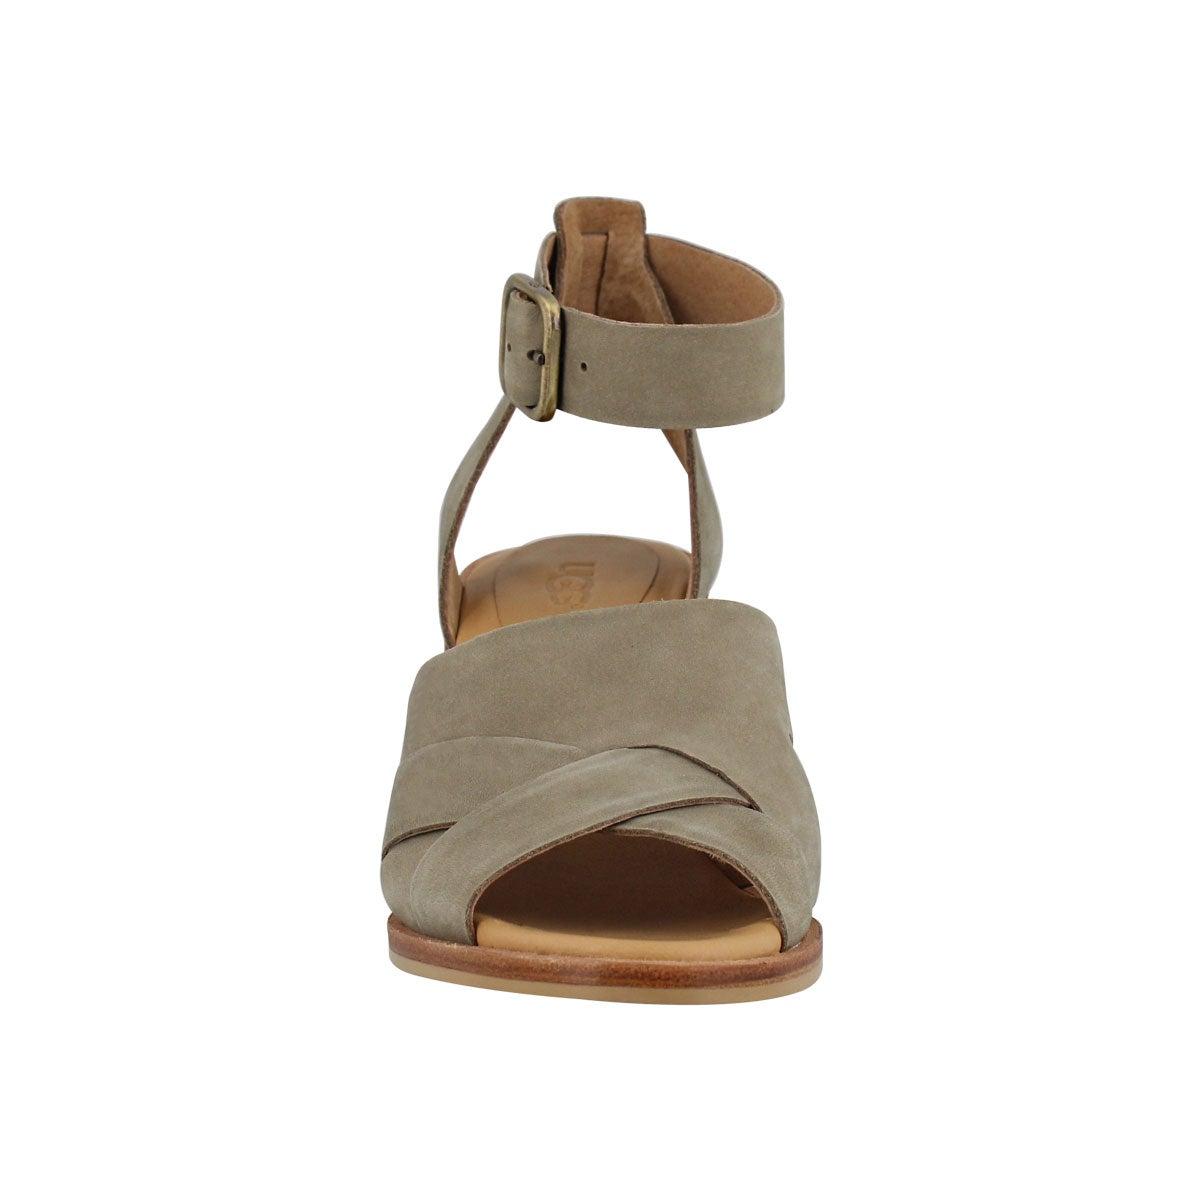 Lds Sandra antilope dress sandal